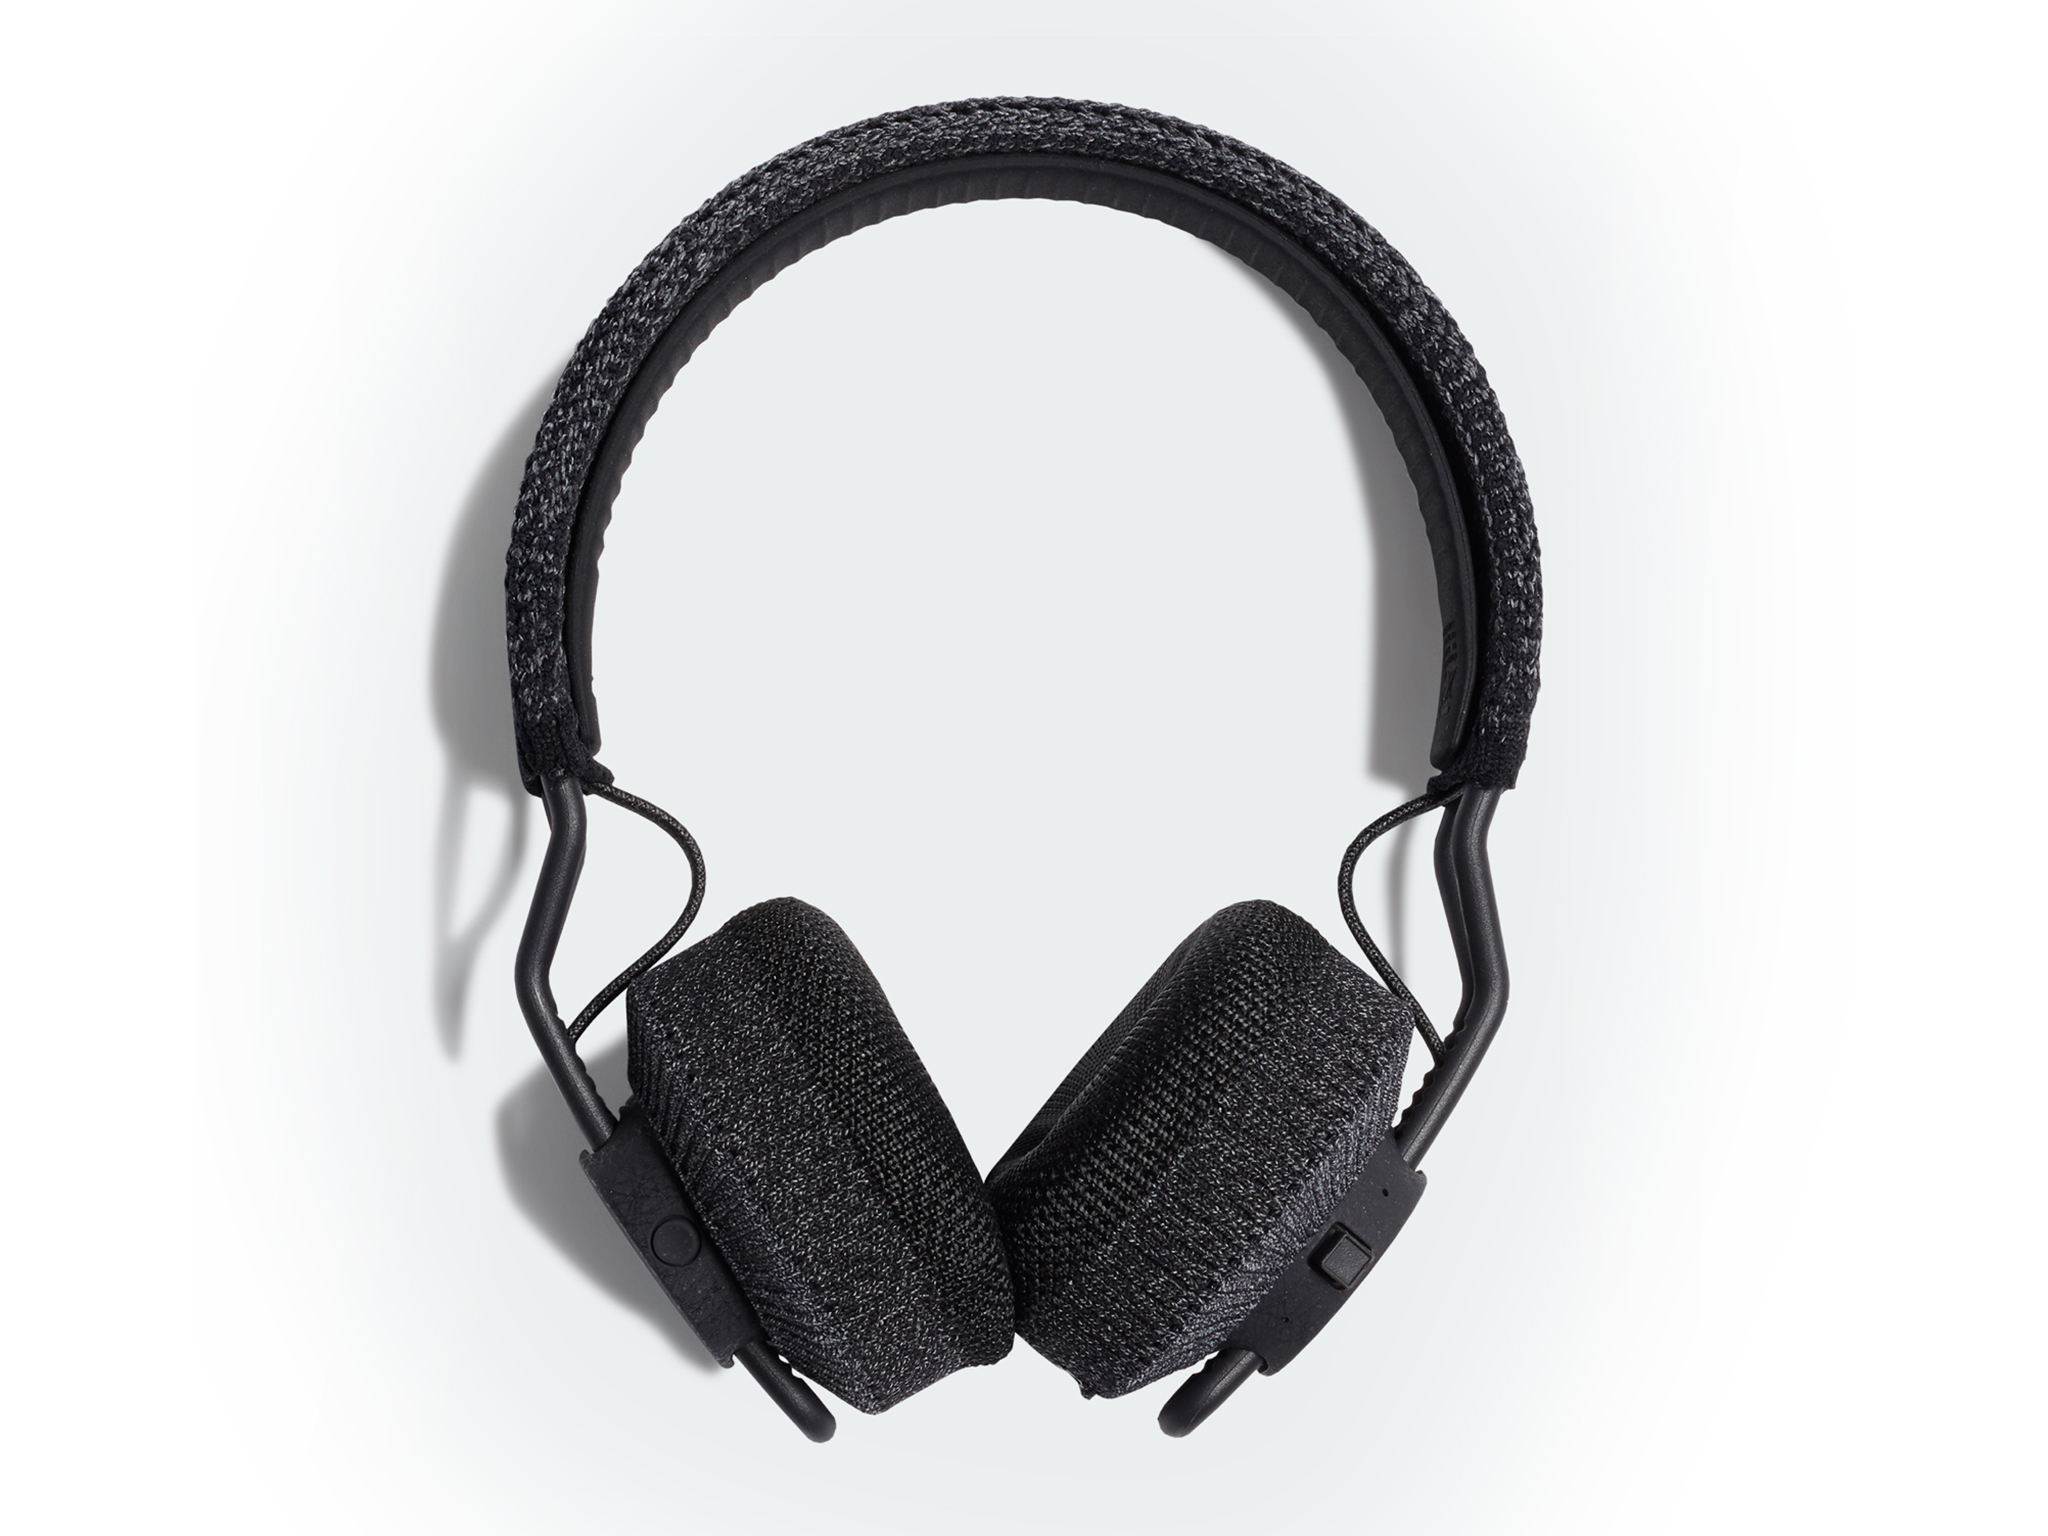 RPT-01 sport on-ear headphones